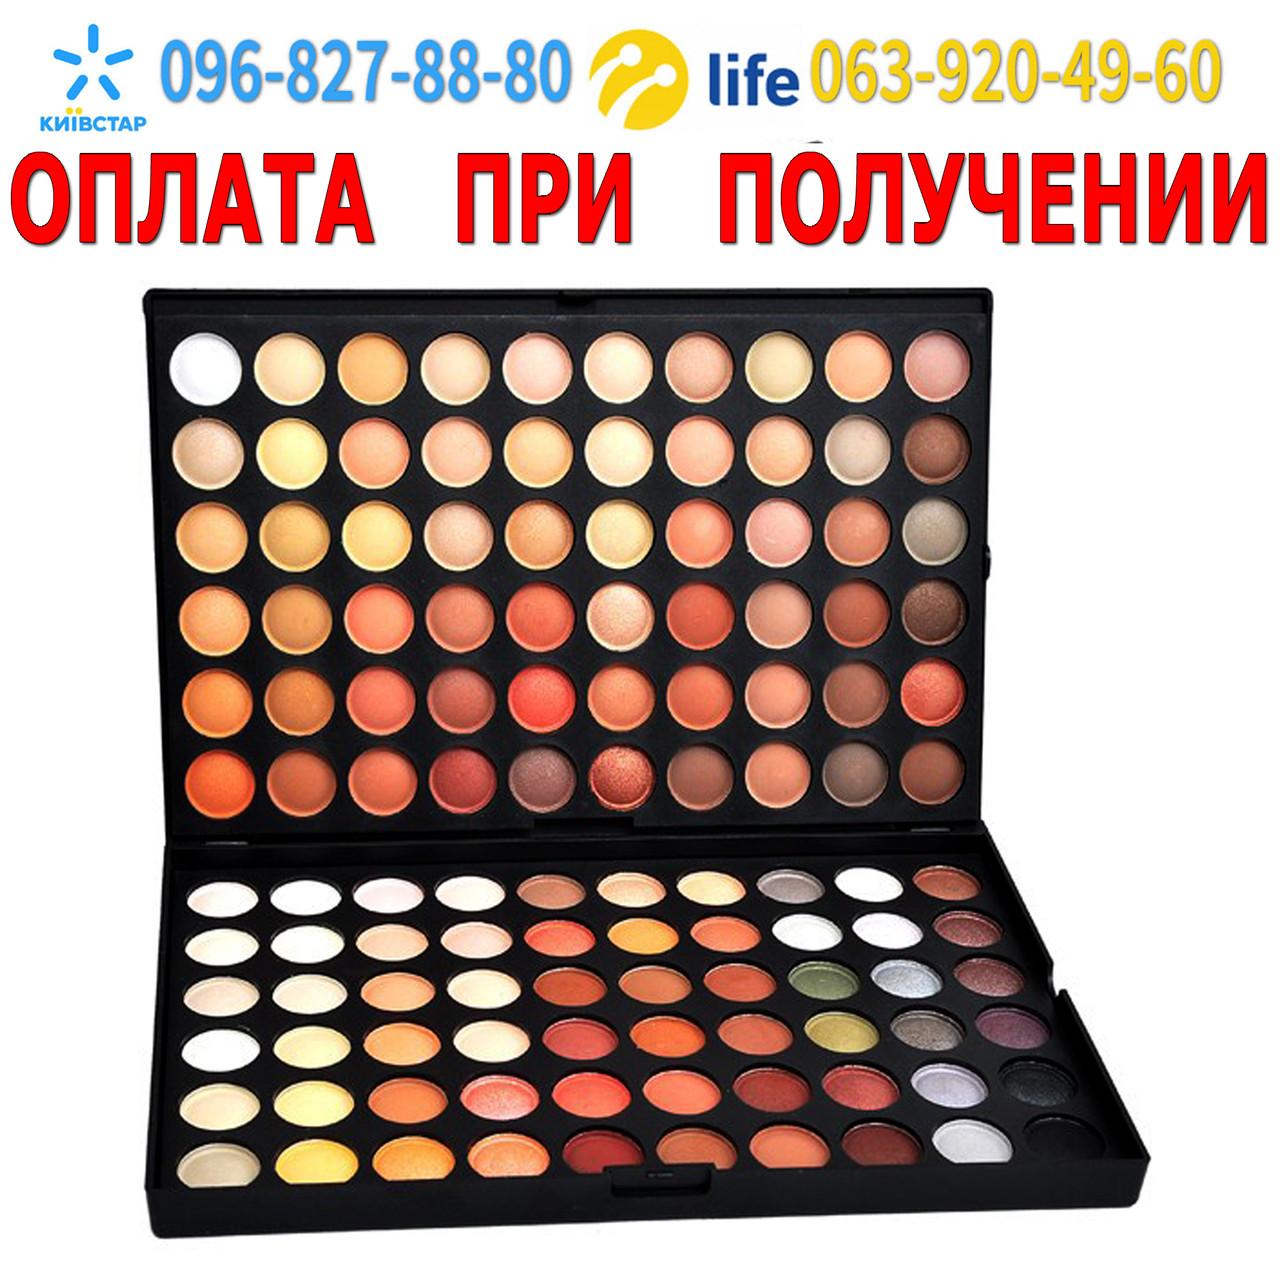 Тени теплых тонов 120 цветов Mac Cosmetics №4 палитра теней палетка  - Интернет-магазин Allegoriya в Днепре